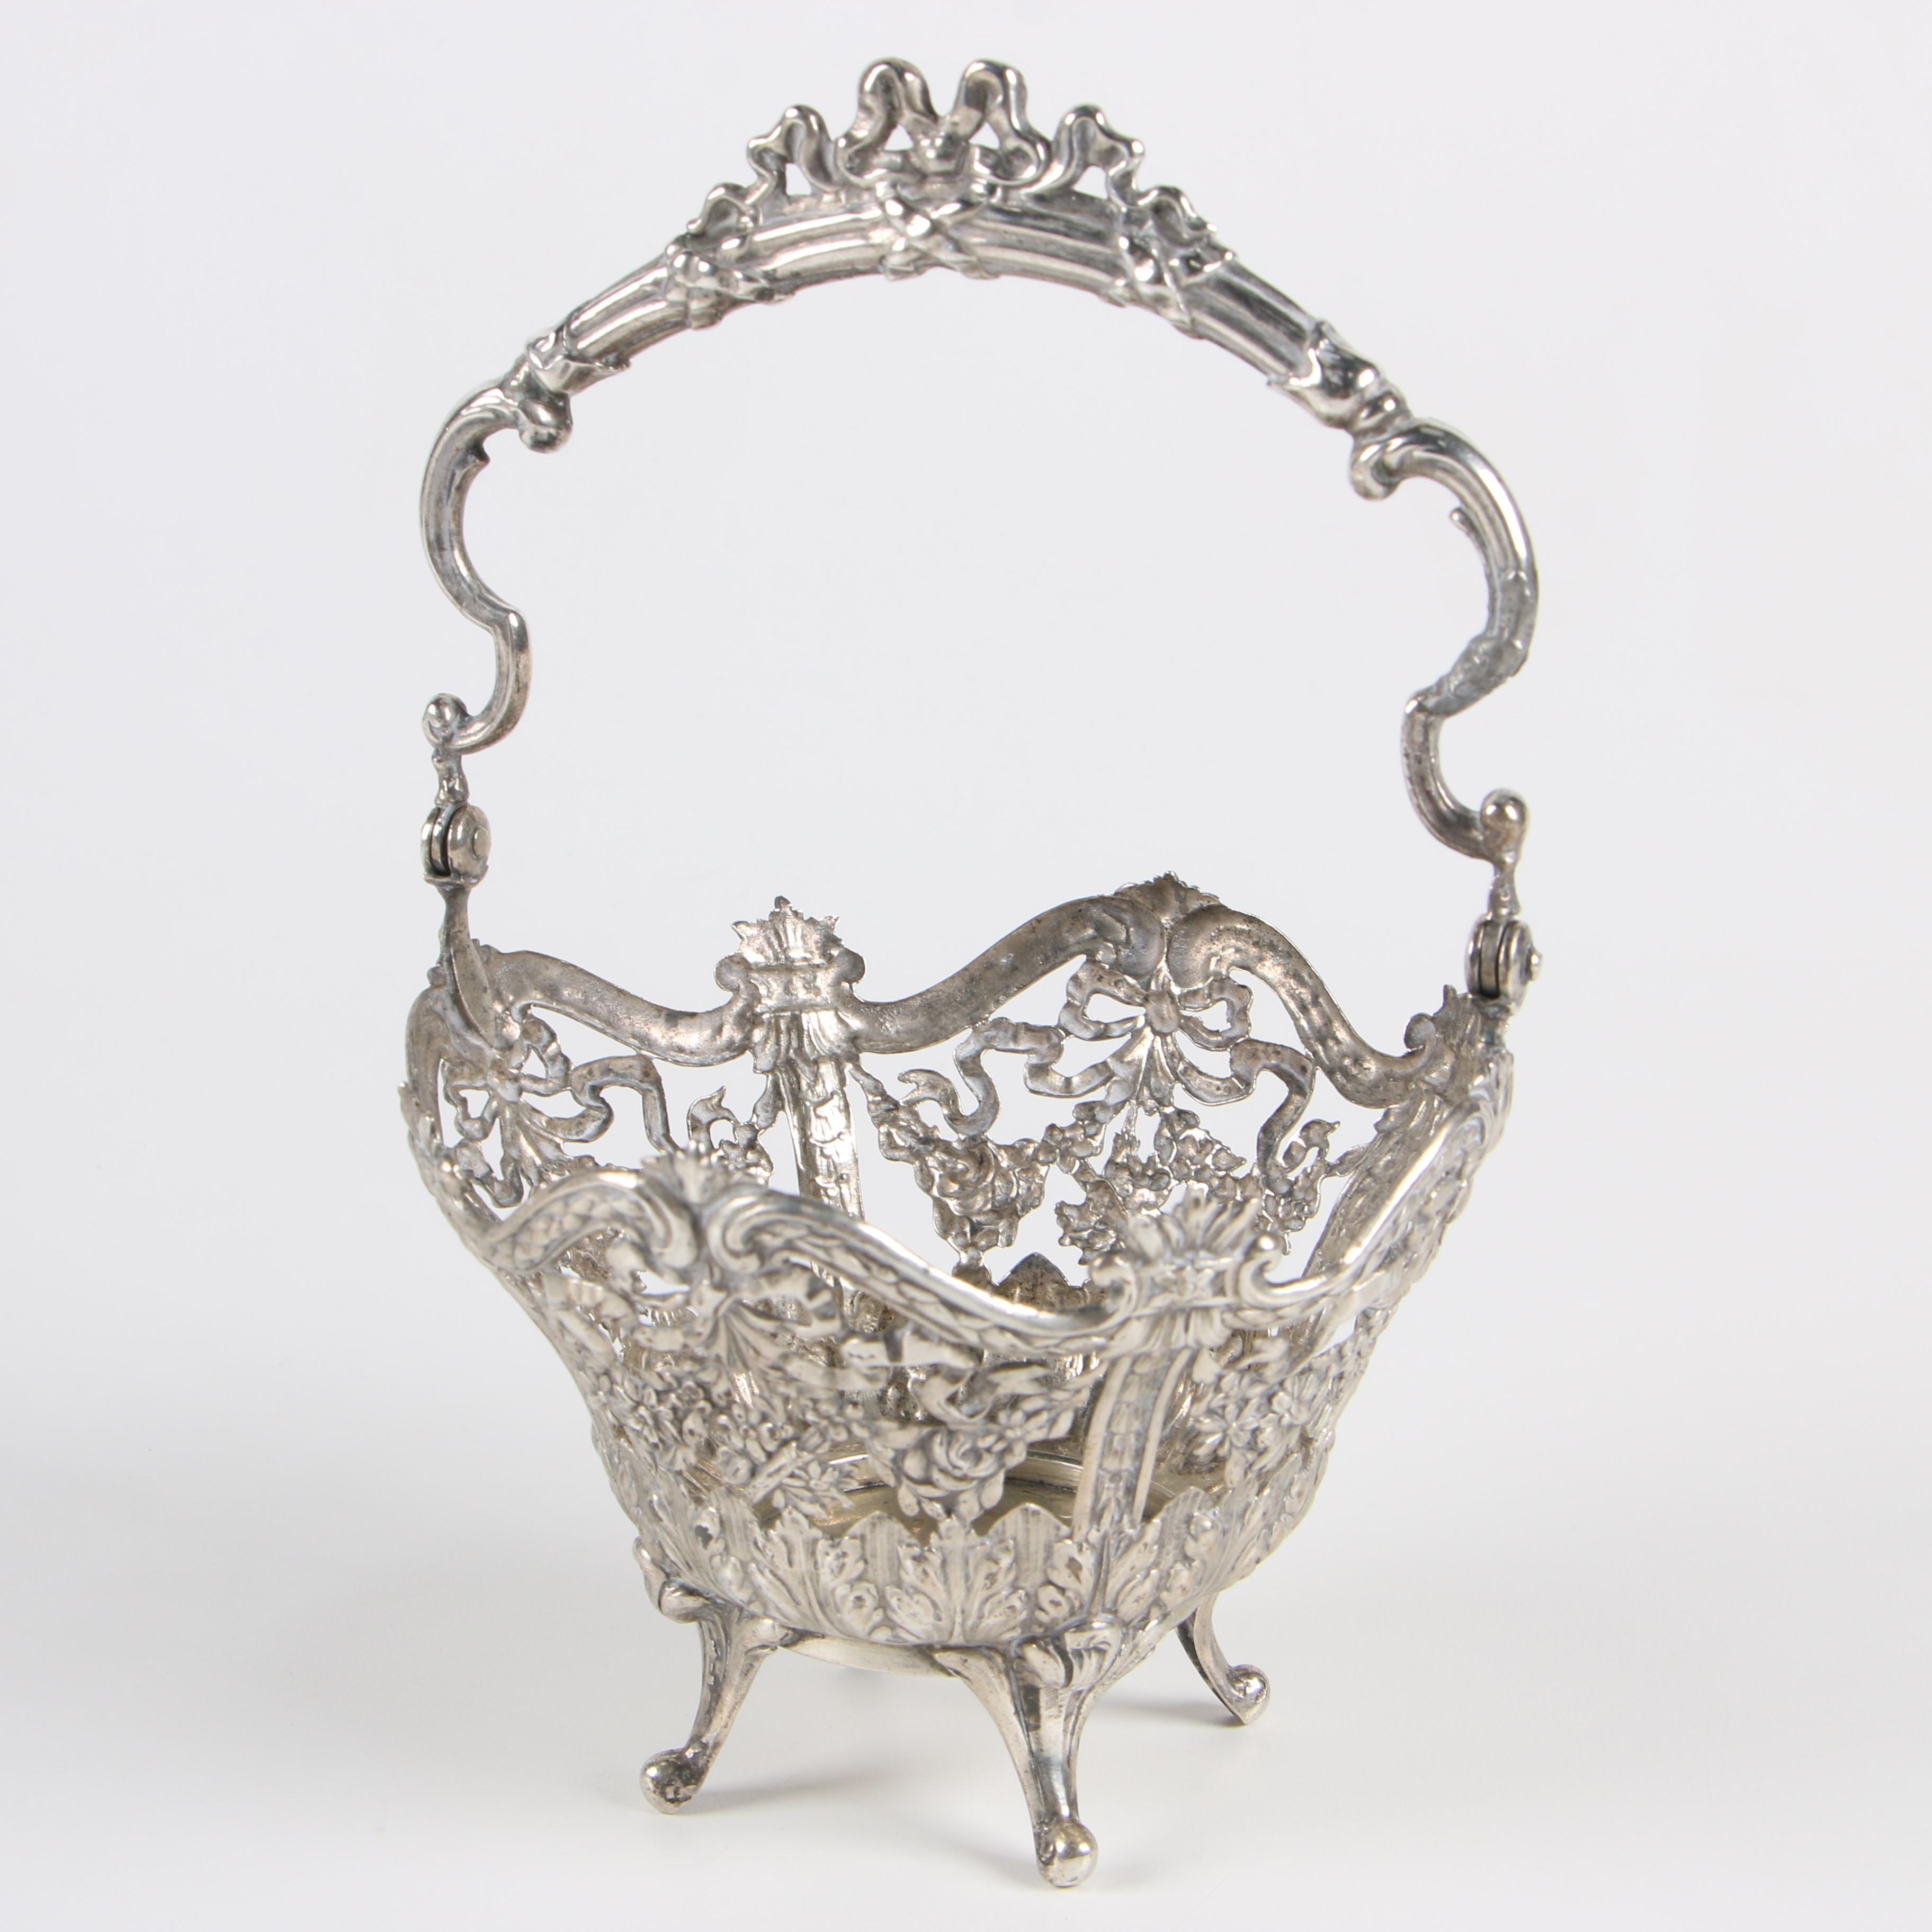 Storck & Sinsheimer 800 Silver Filigree Basket